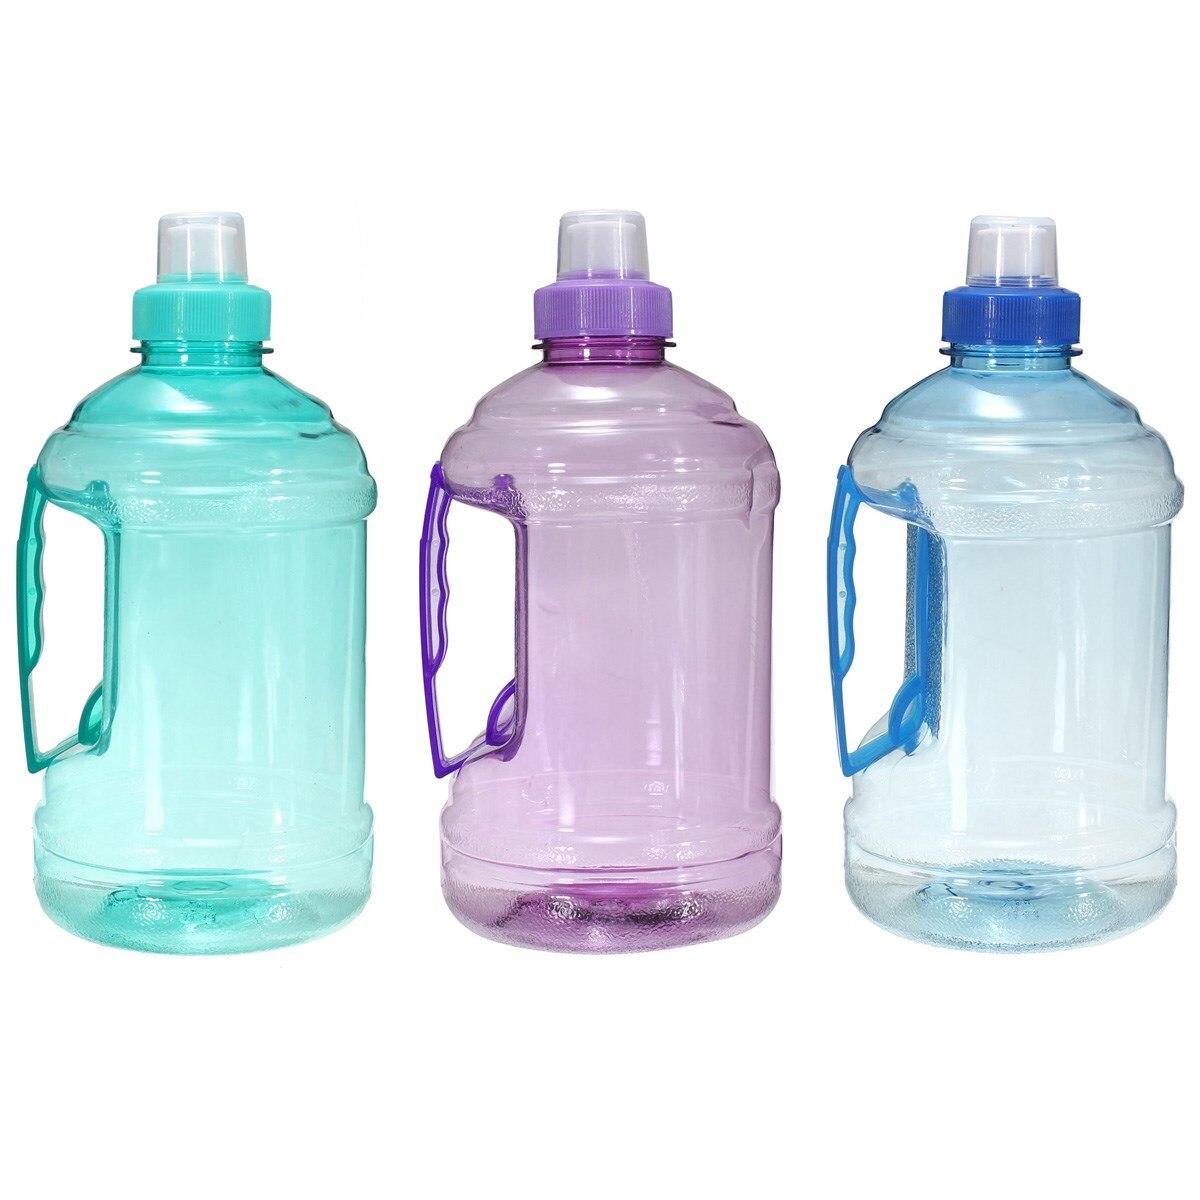 Botella de agua grande de plástico para bebidas 1L/2L para deportes, Picnic, bicicleta, libre de BPA